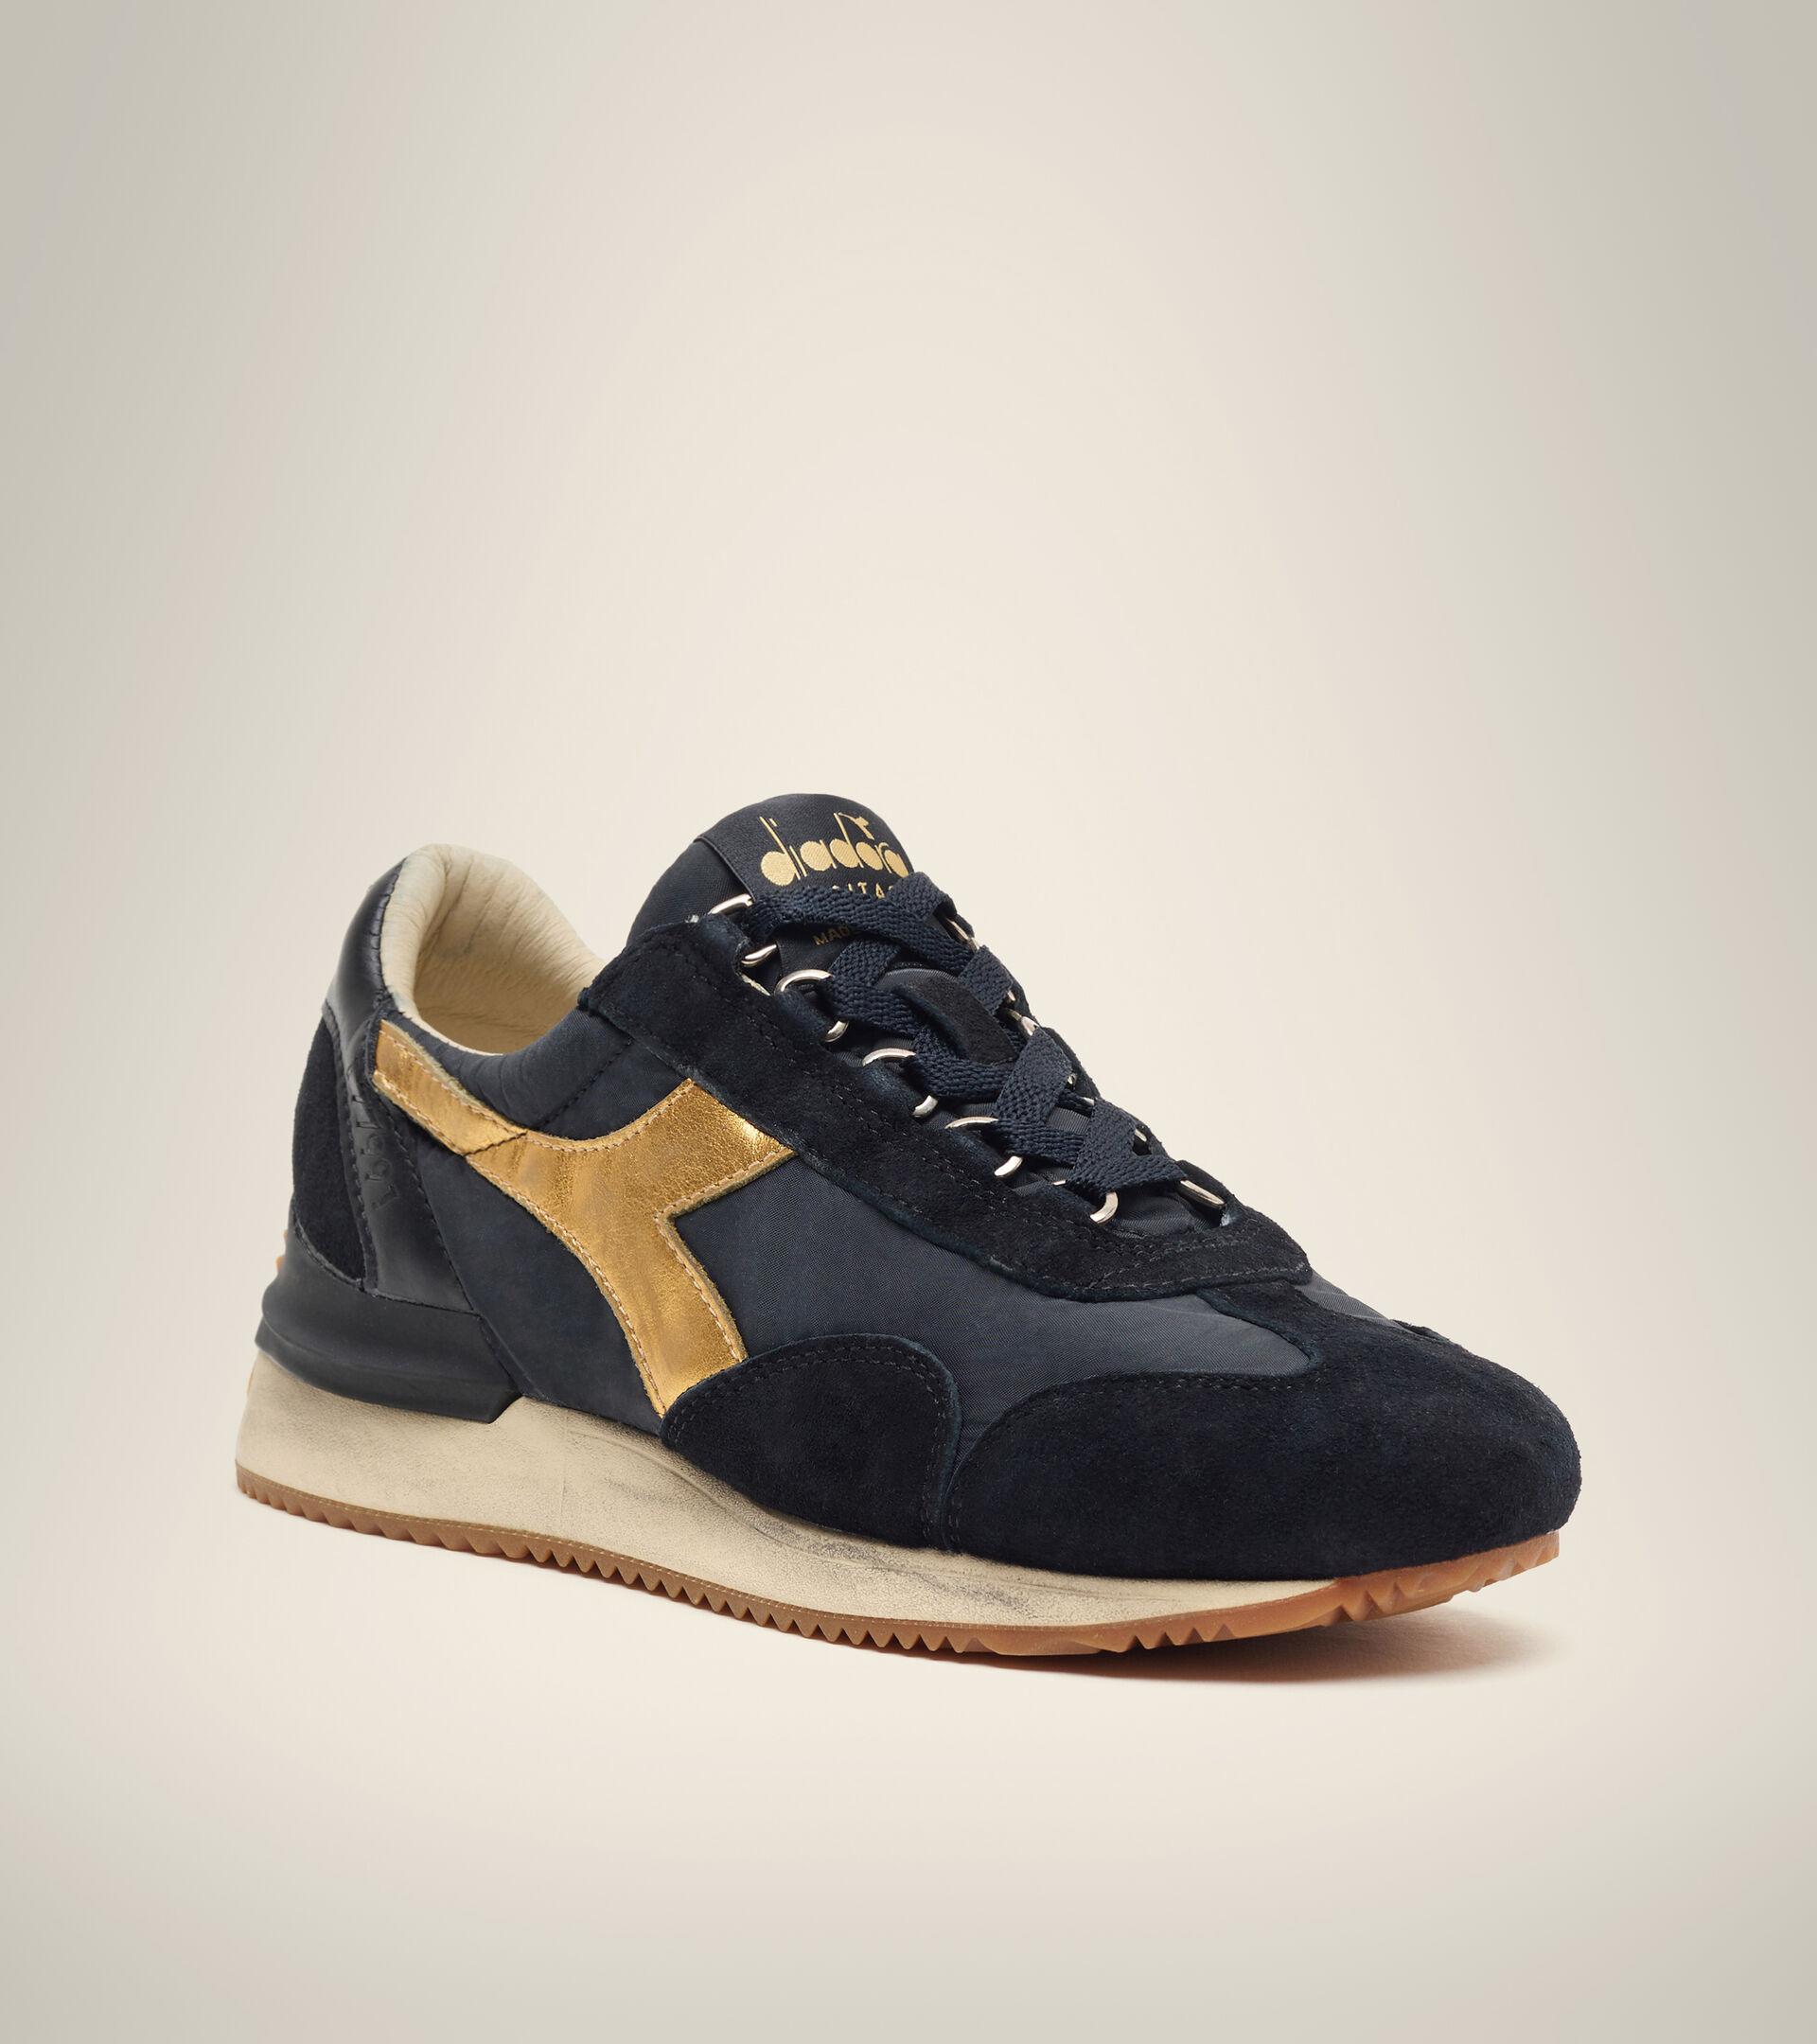 Footwear Heritage DONNA EQUIPE MAD ITALIA LUNA WN BLACK Diadora